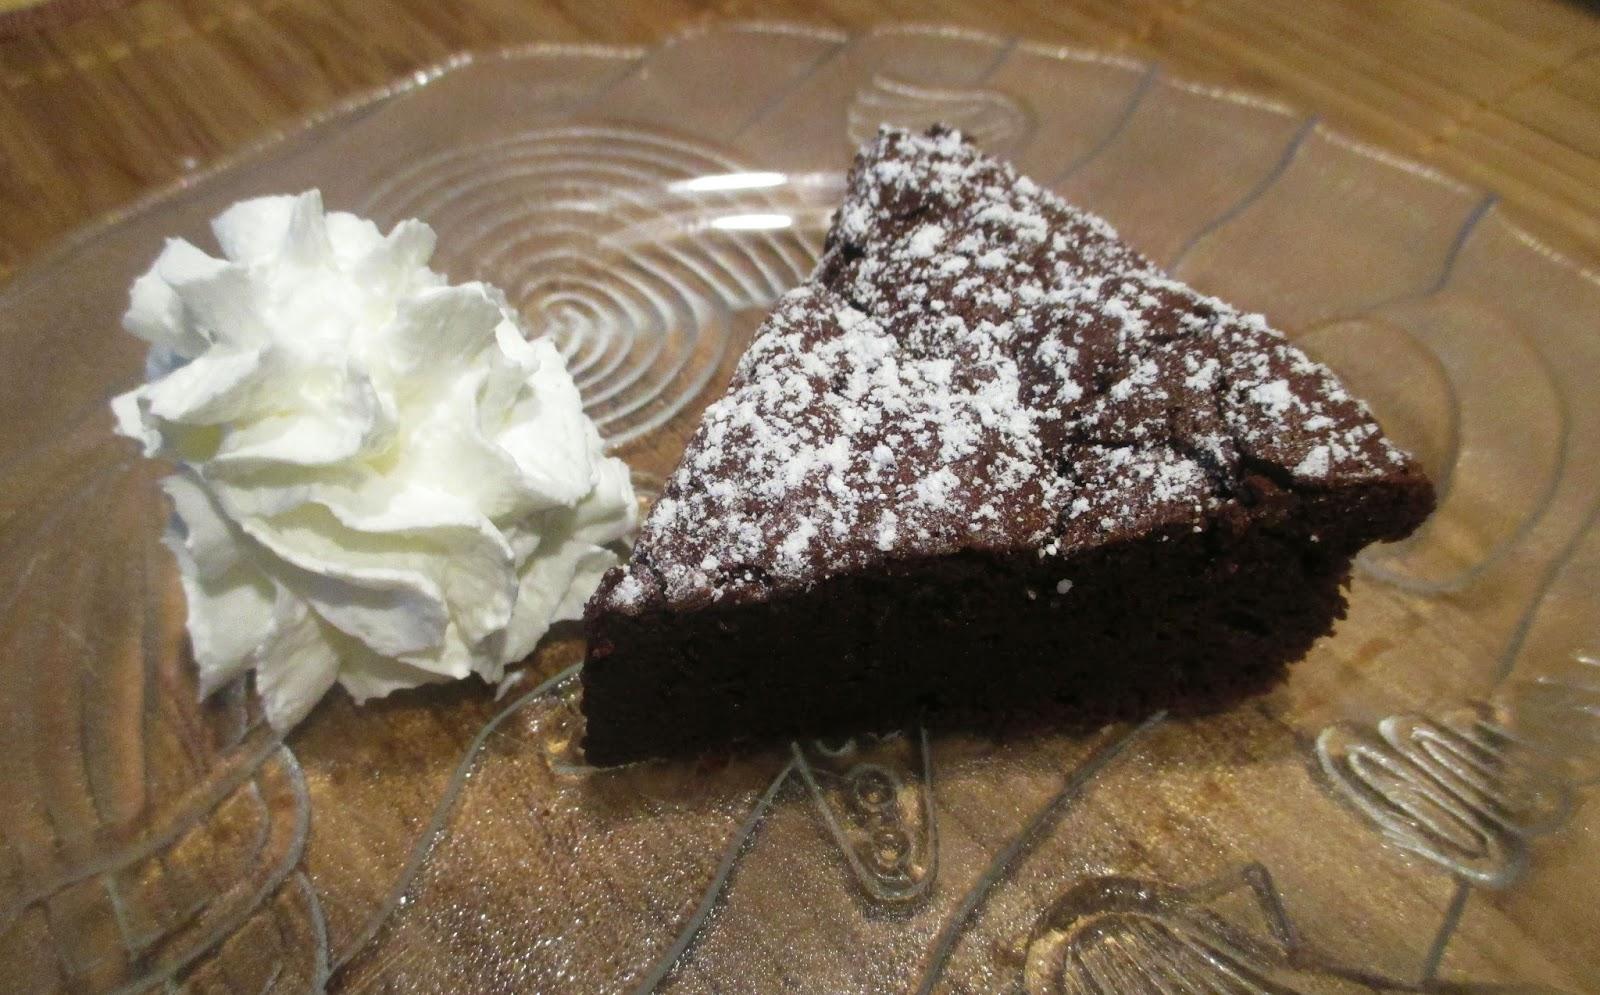 Otaku Family 2 Zutaten Schokolade Kuchen 材料2つでガトーショコラの